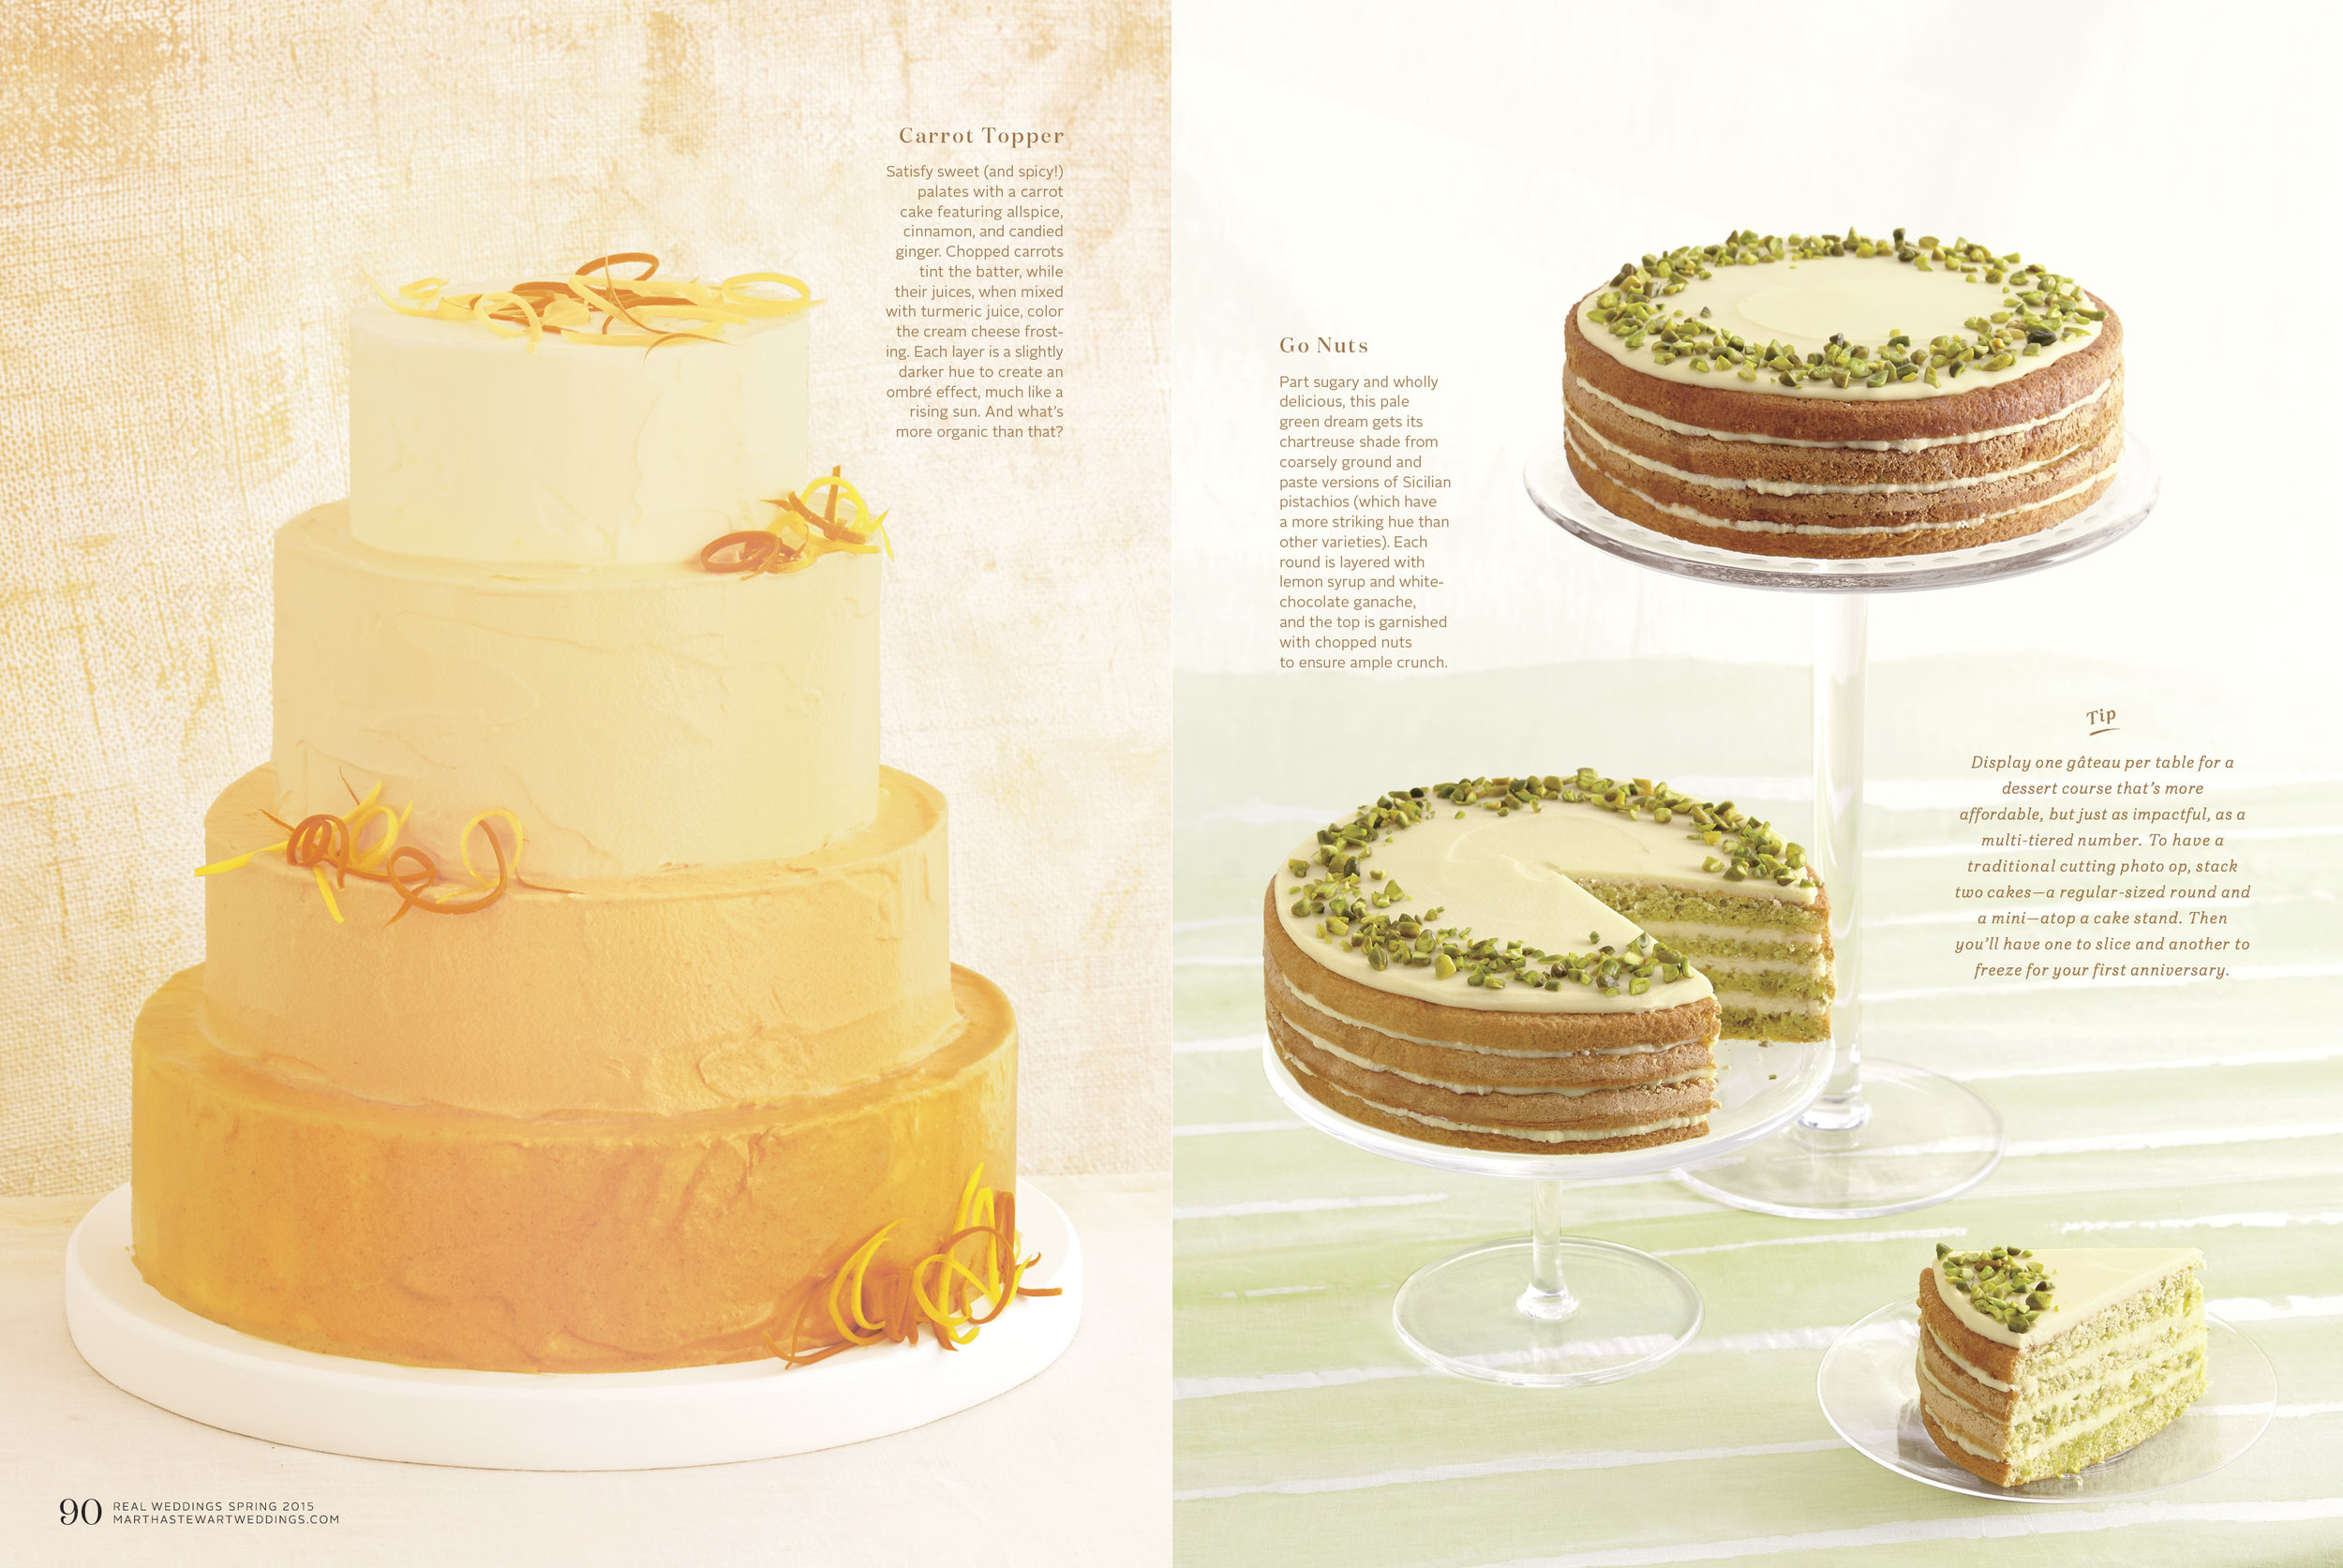 Carrot Cake and Lemon Pistachio Cake, Martha Stewart Weddings